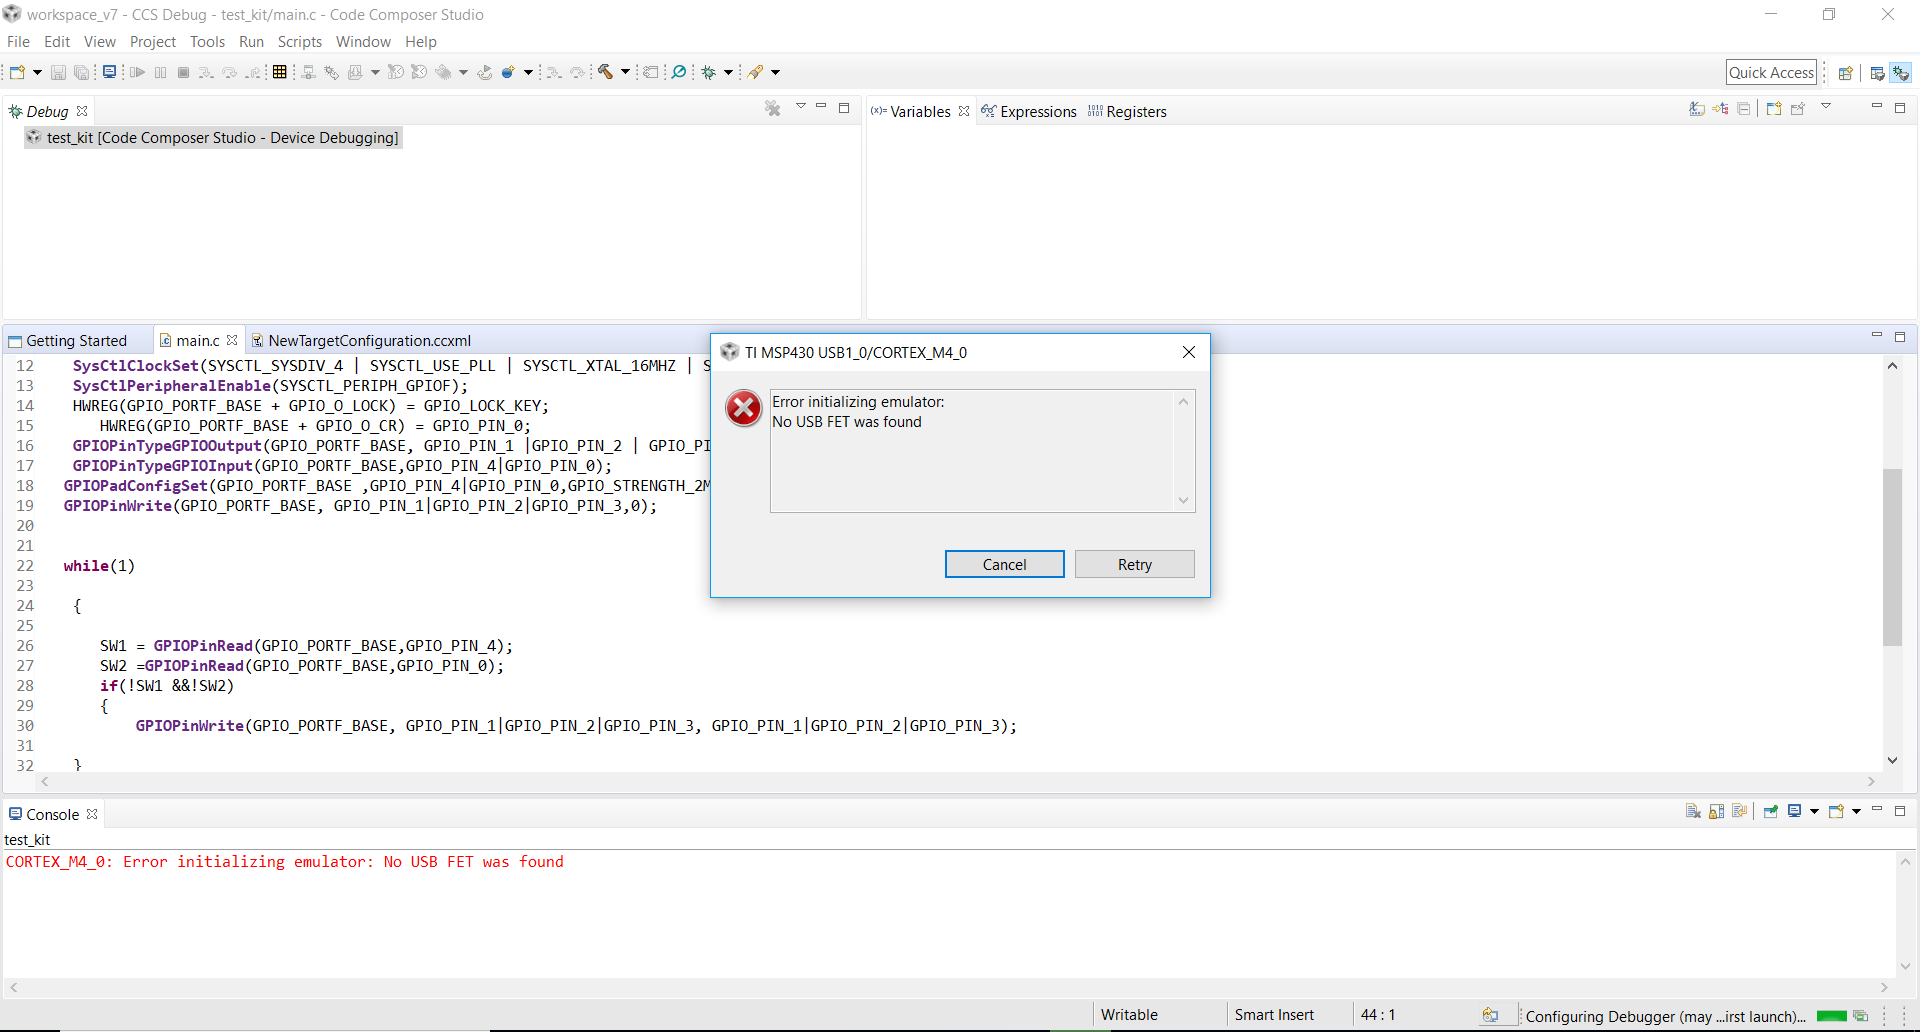 CCS/TM4C123GH6PM: Error initializing emulator: No USB FET was found